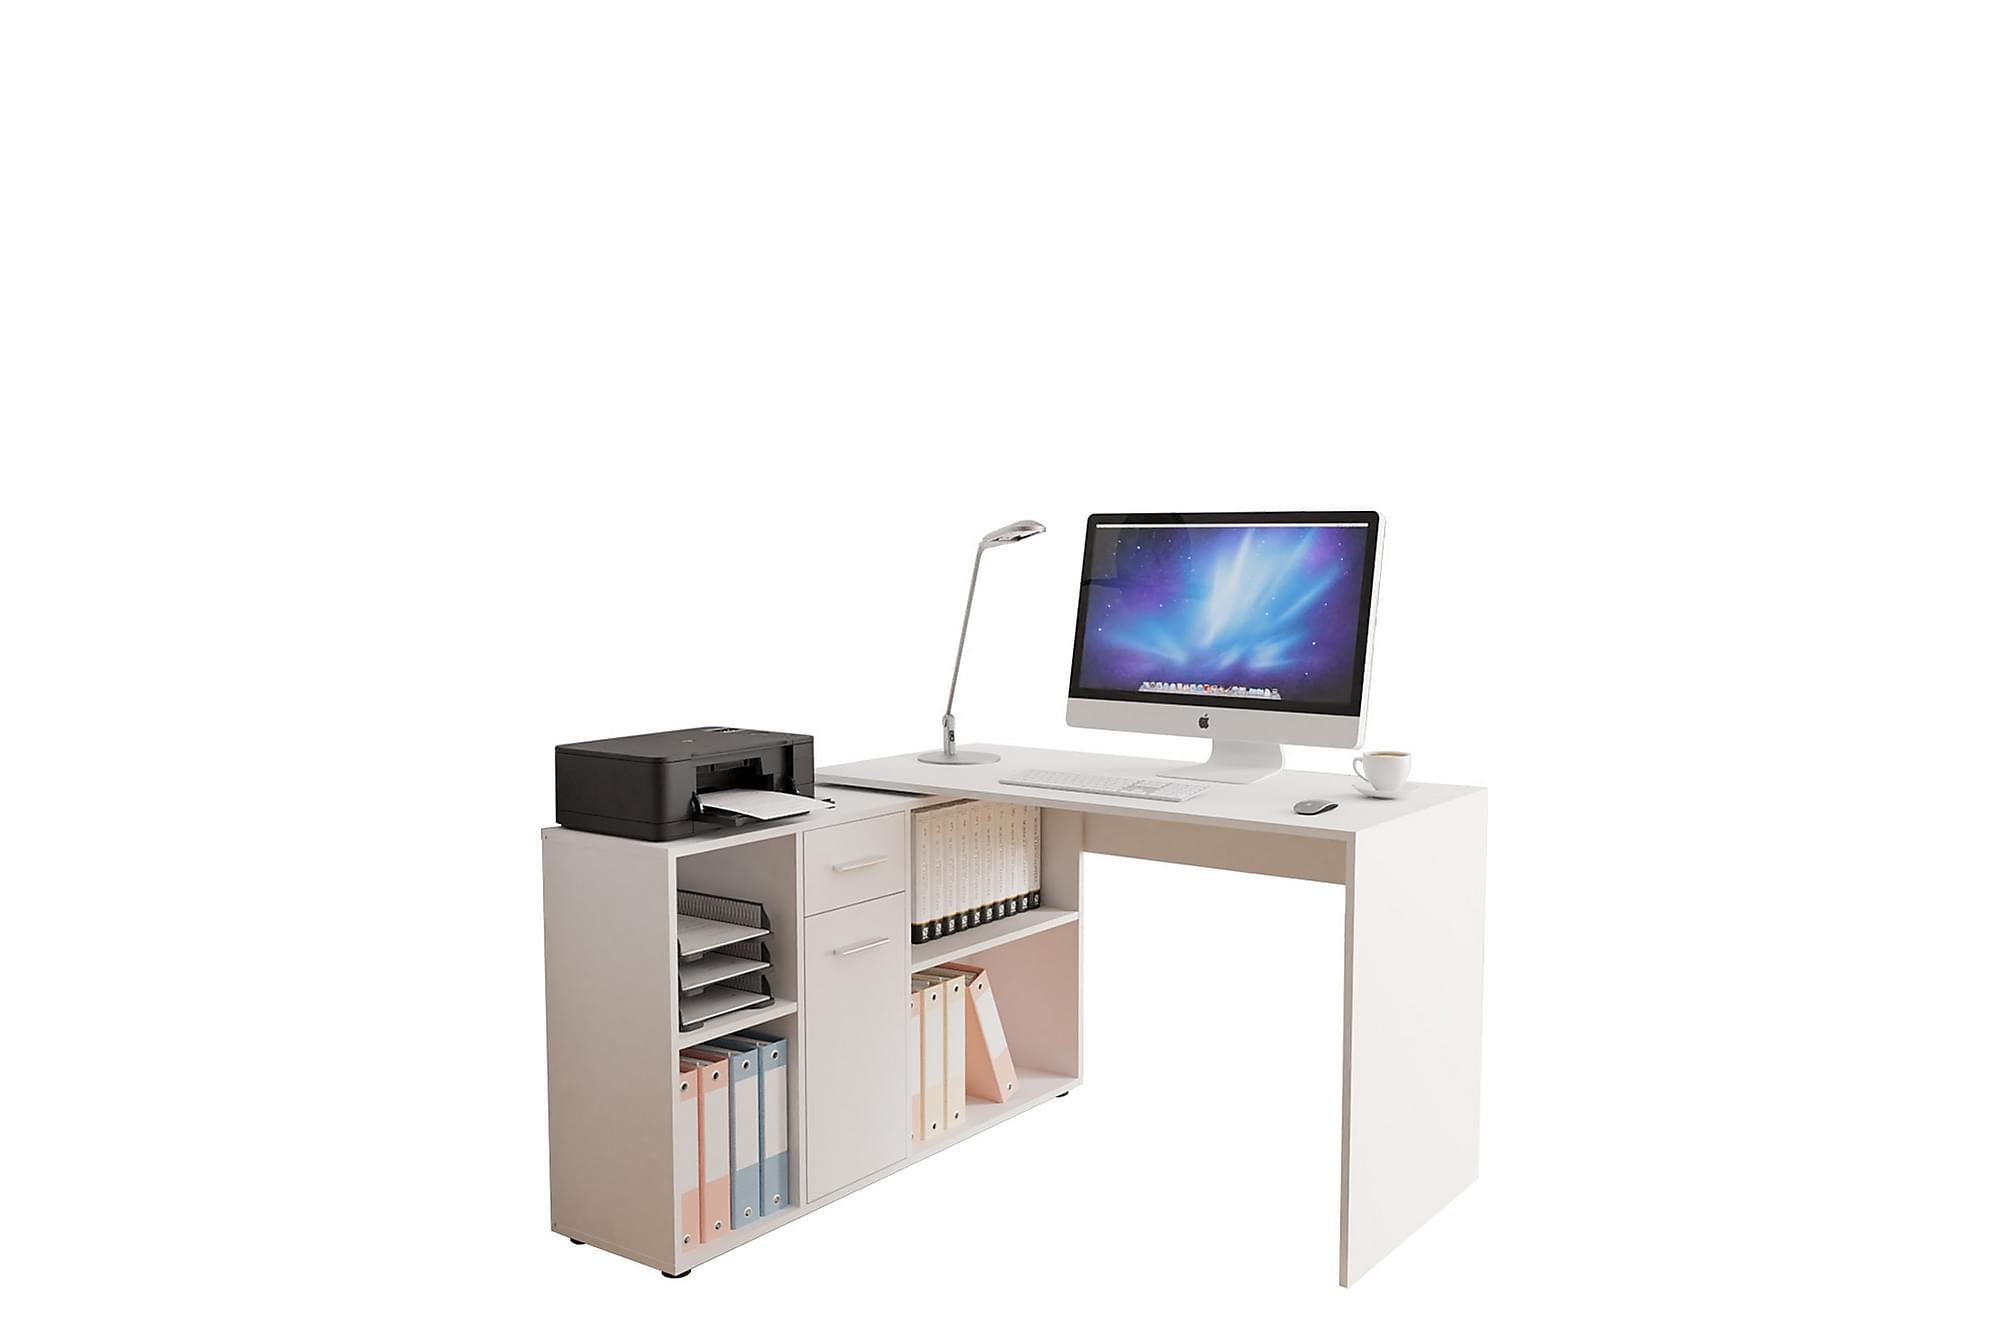 ARMANDO Skrivbord 120x121 cm Vit, Bord